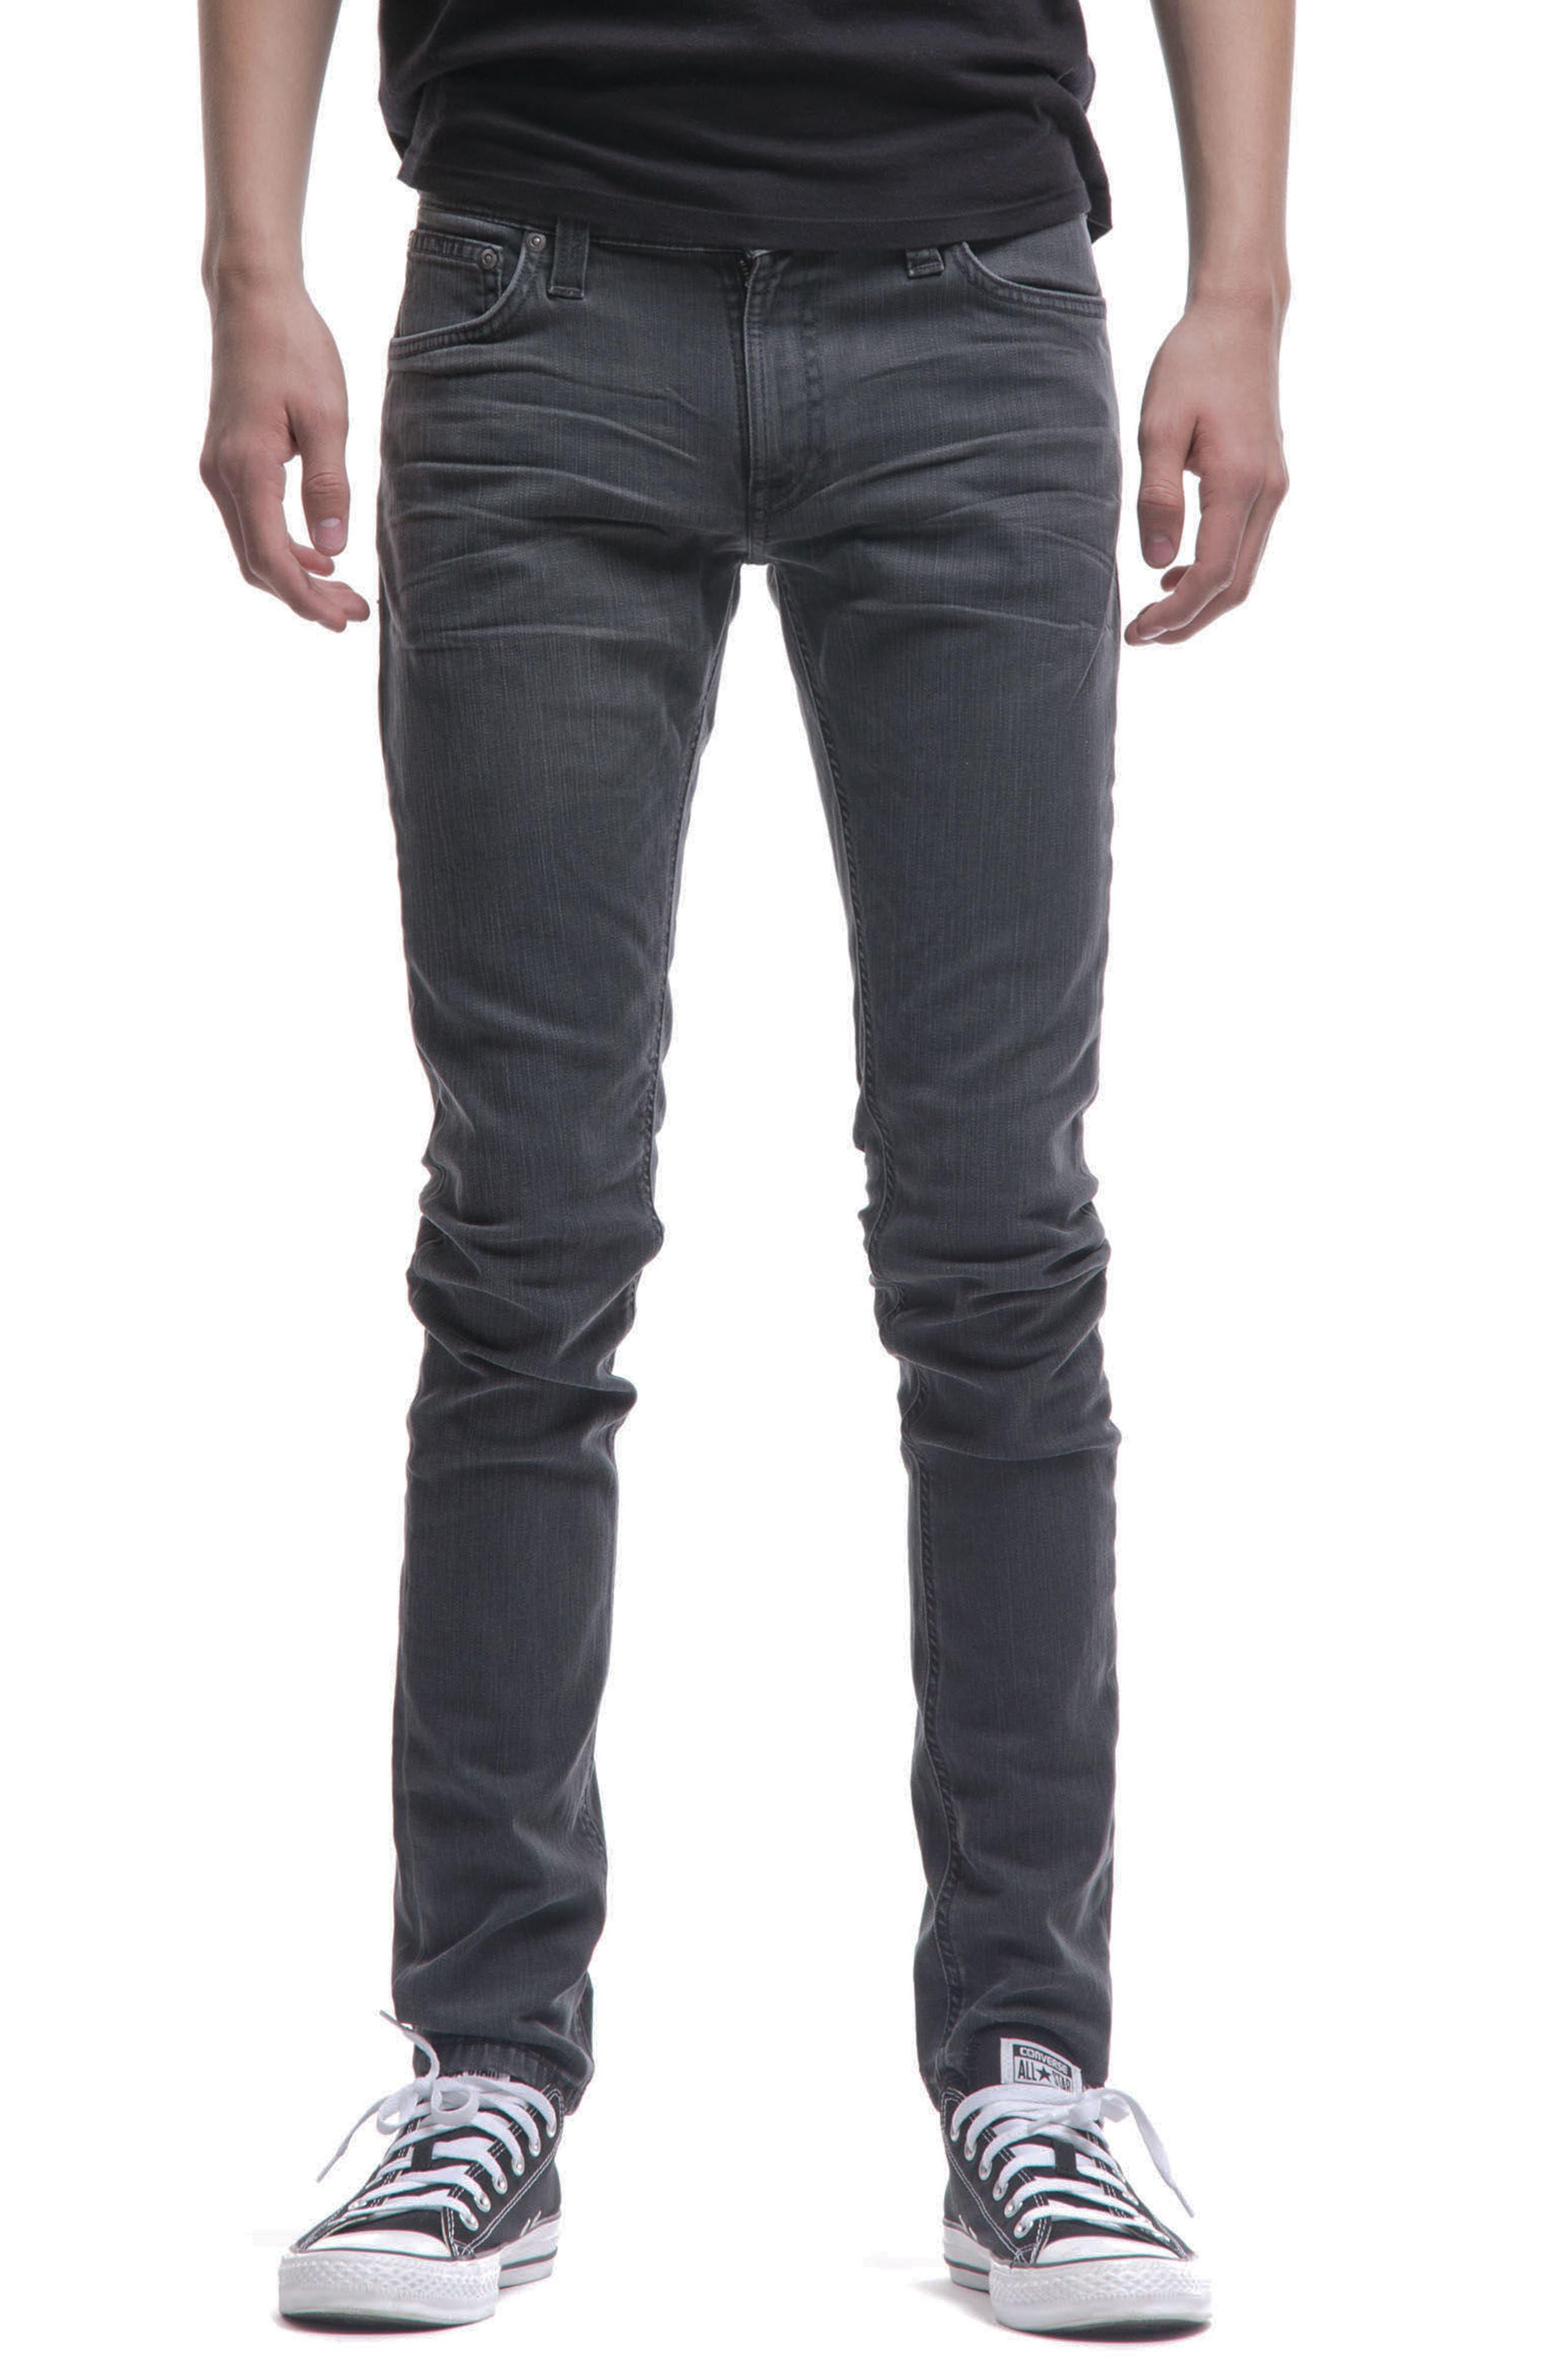 Skinny Lin Skinny Fit Jeans,                             Main thumbnail 1, color,                             Black Seas